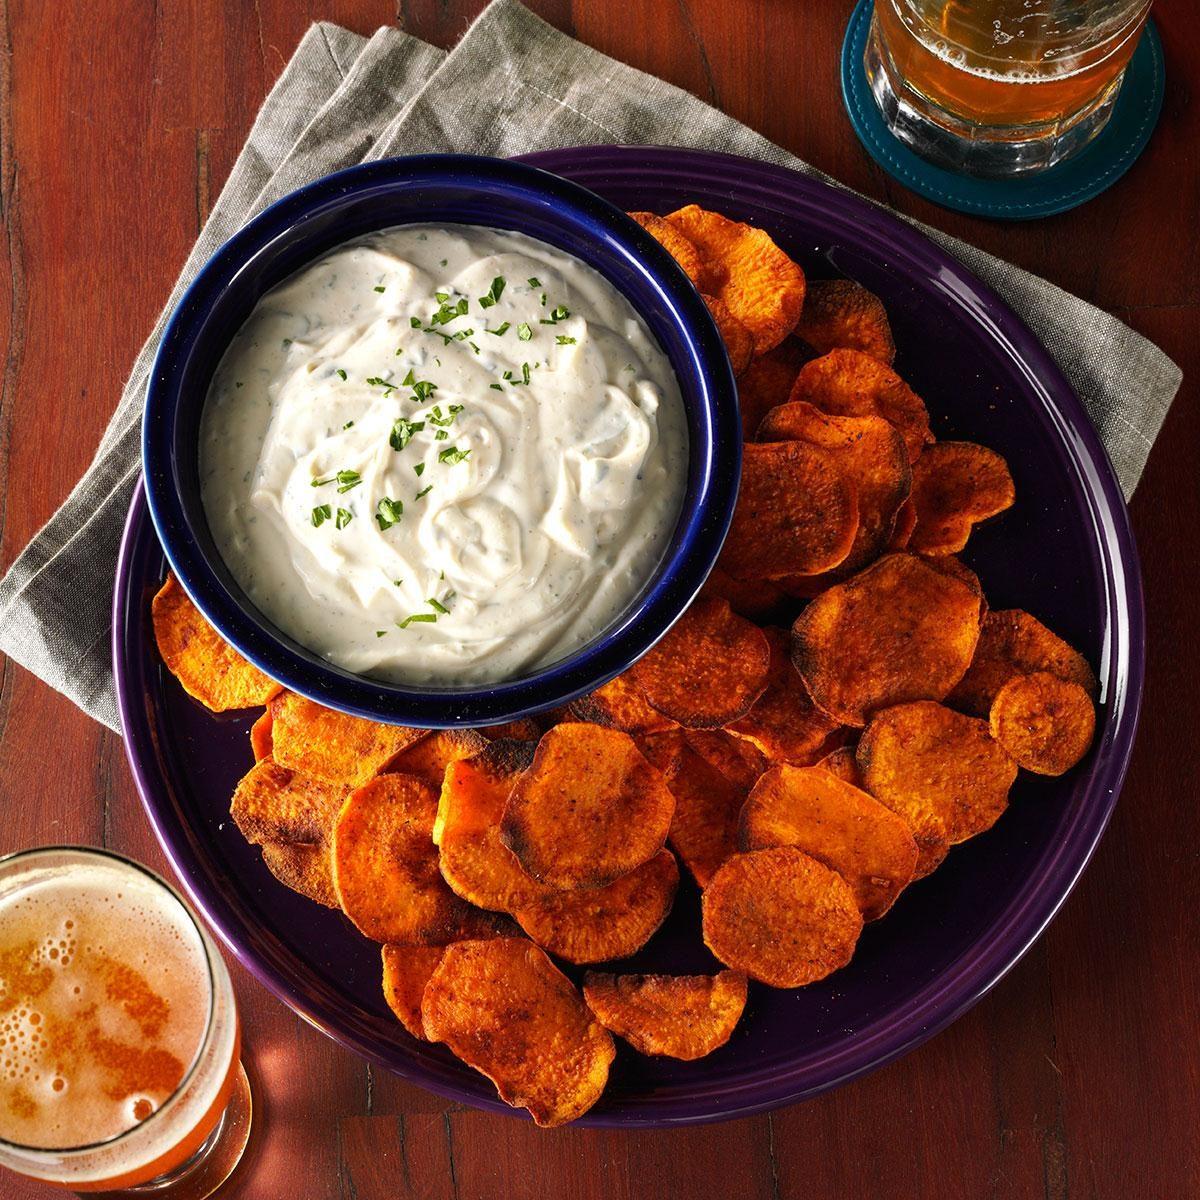 Spicy Sweet Potato Chips & Cilantro Dip